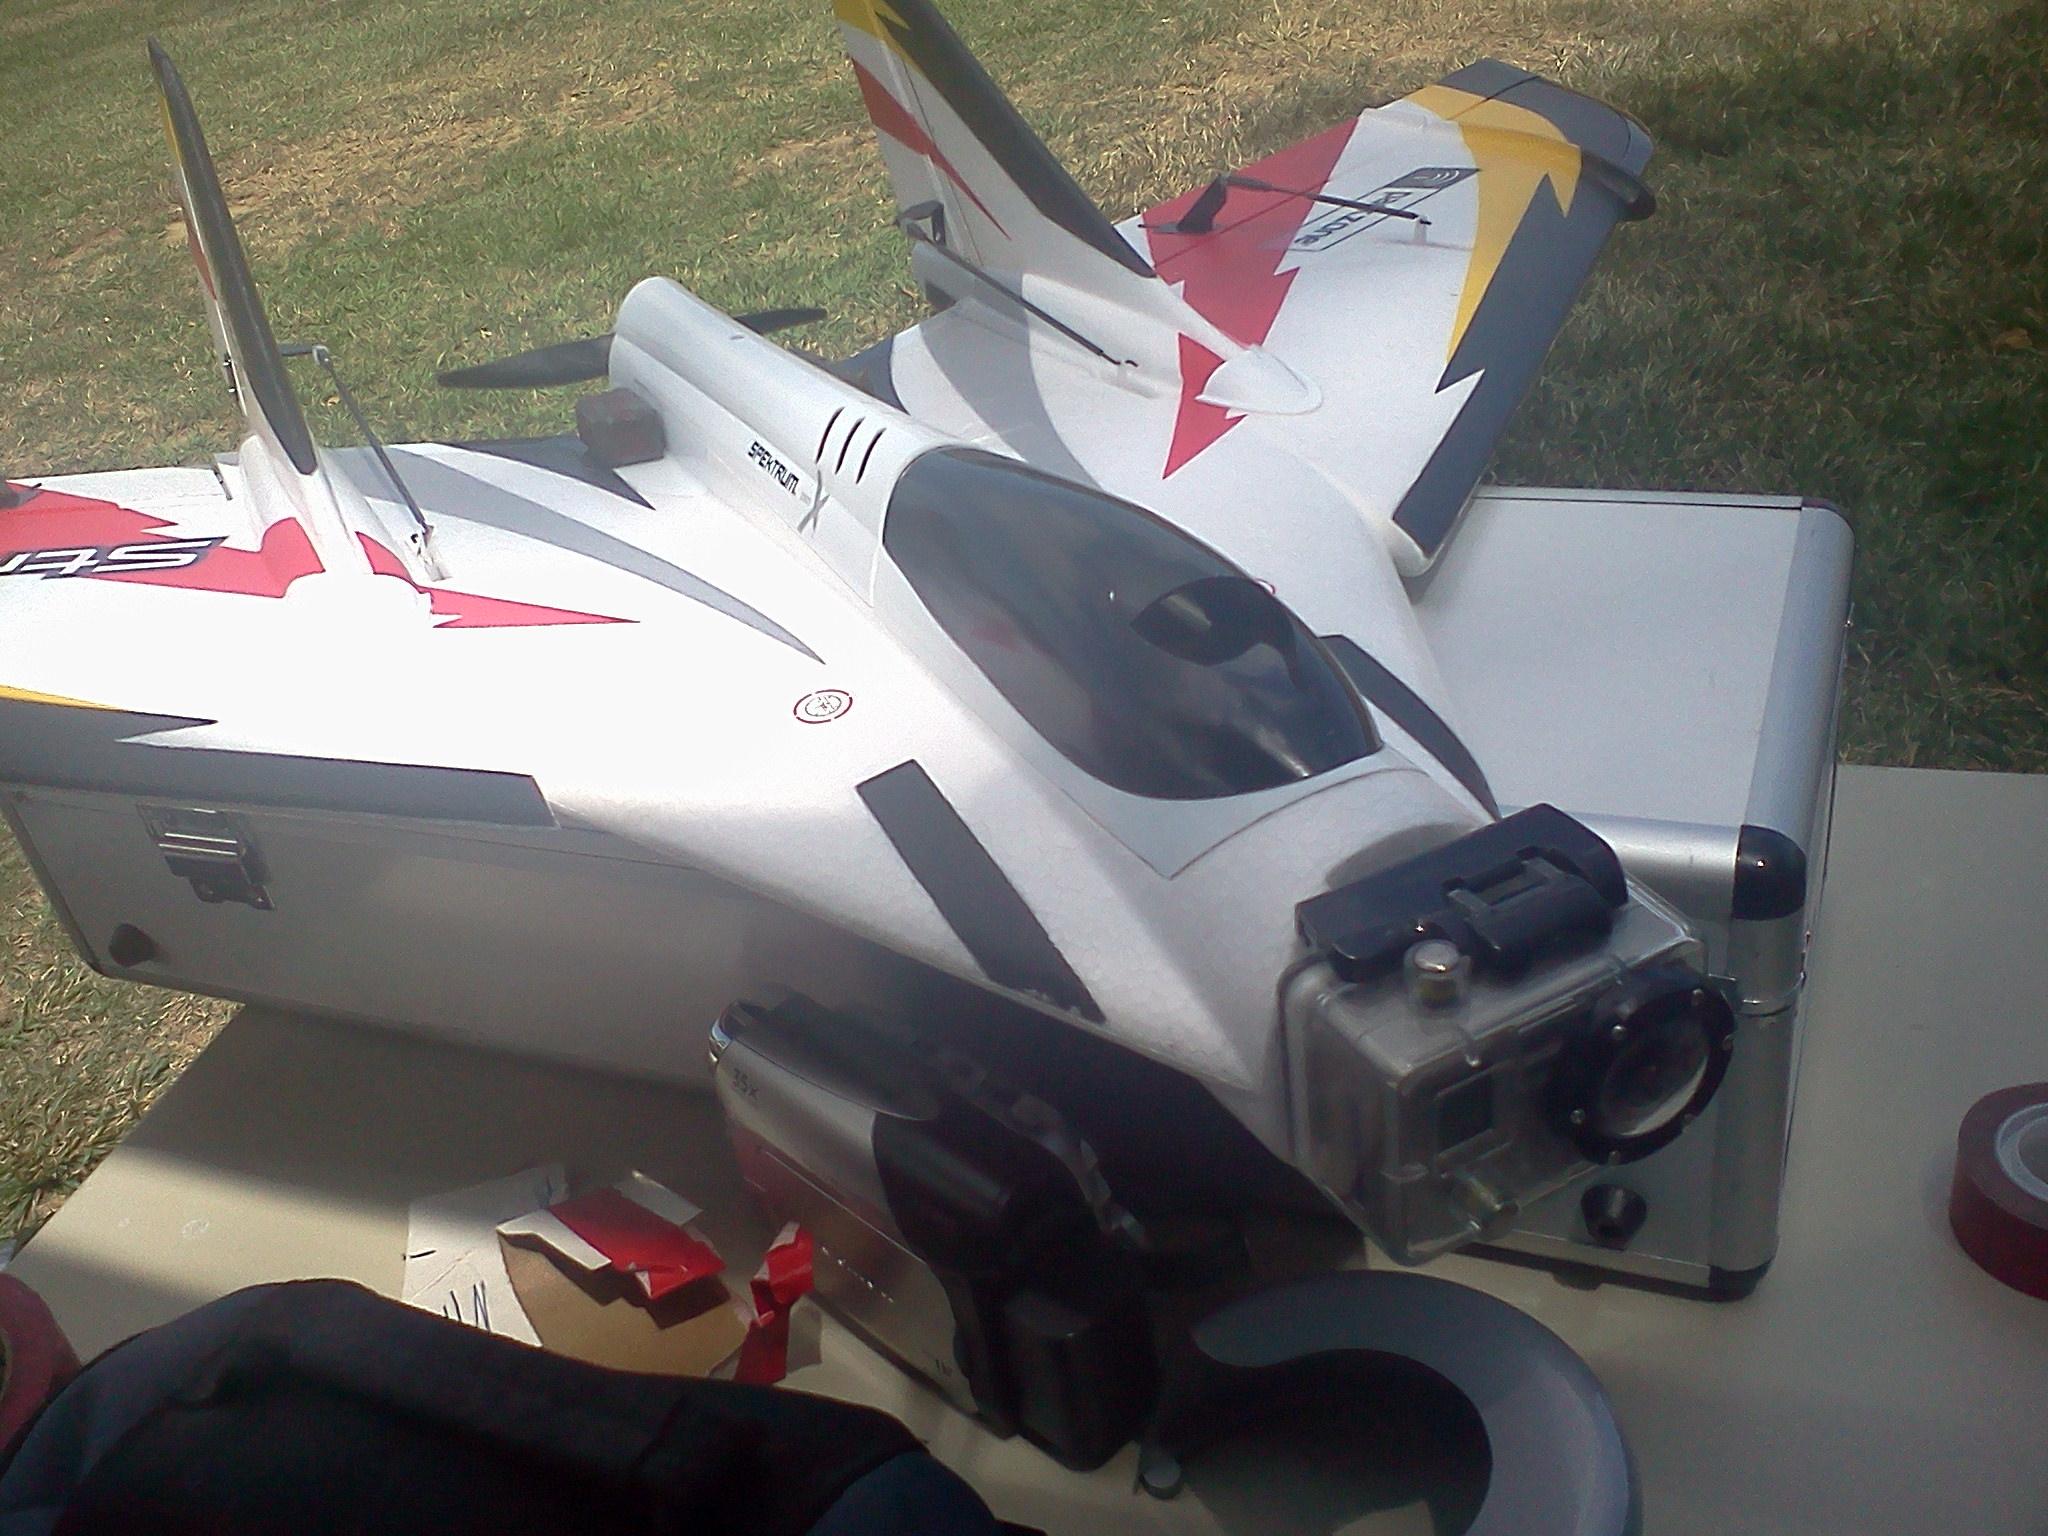 Speedy Camera Plane